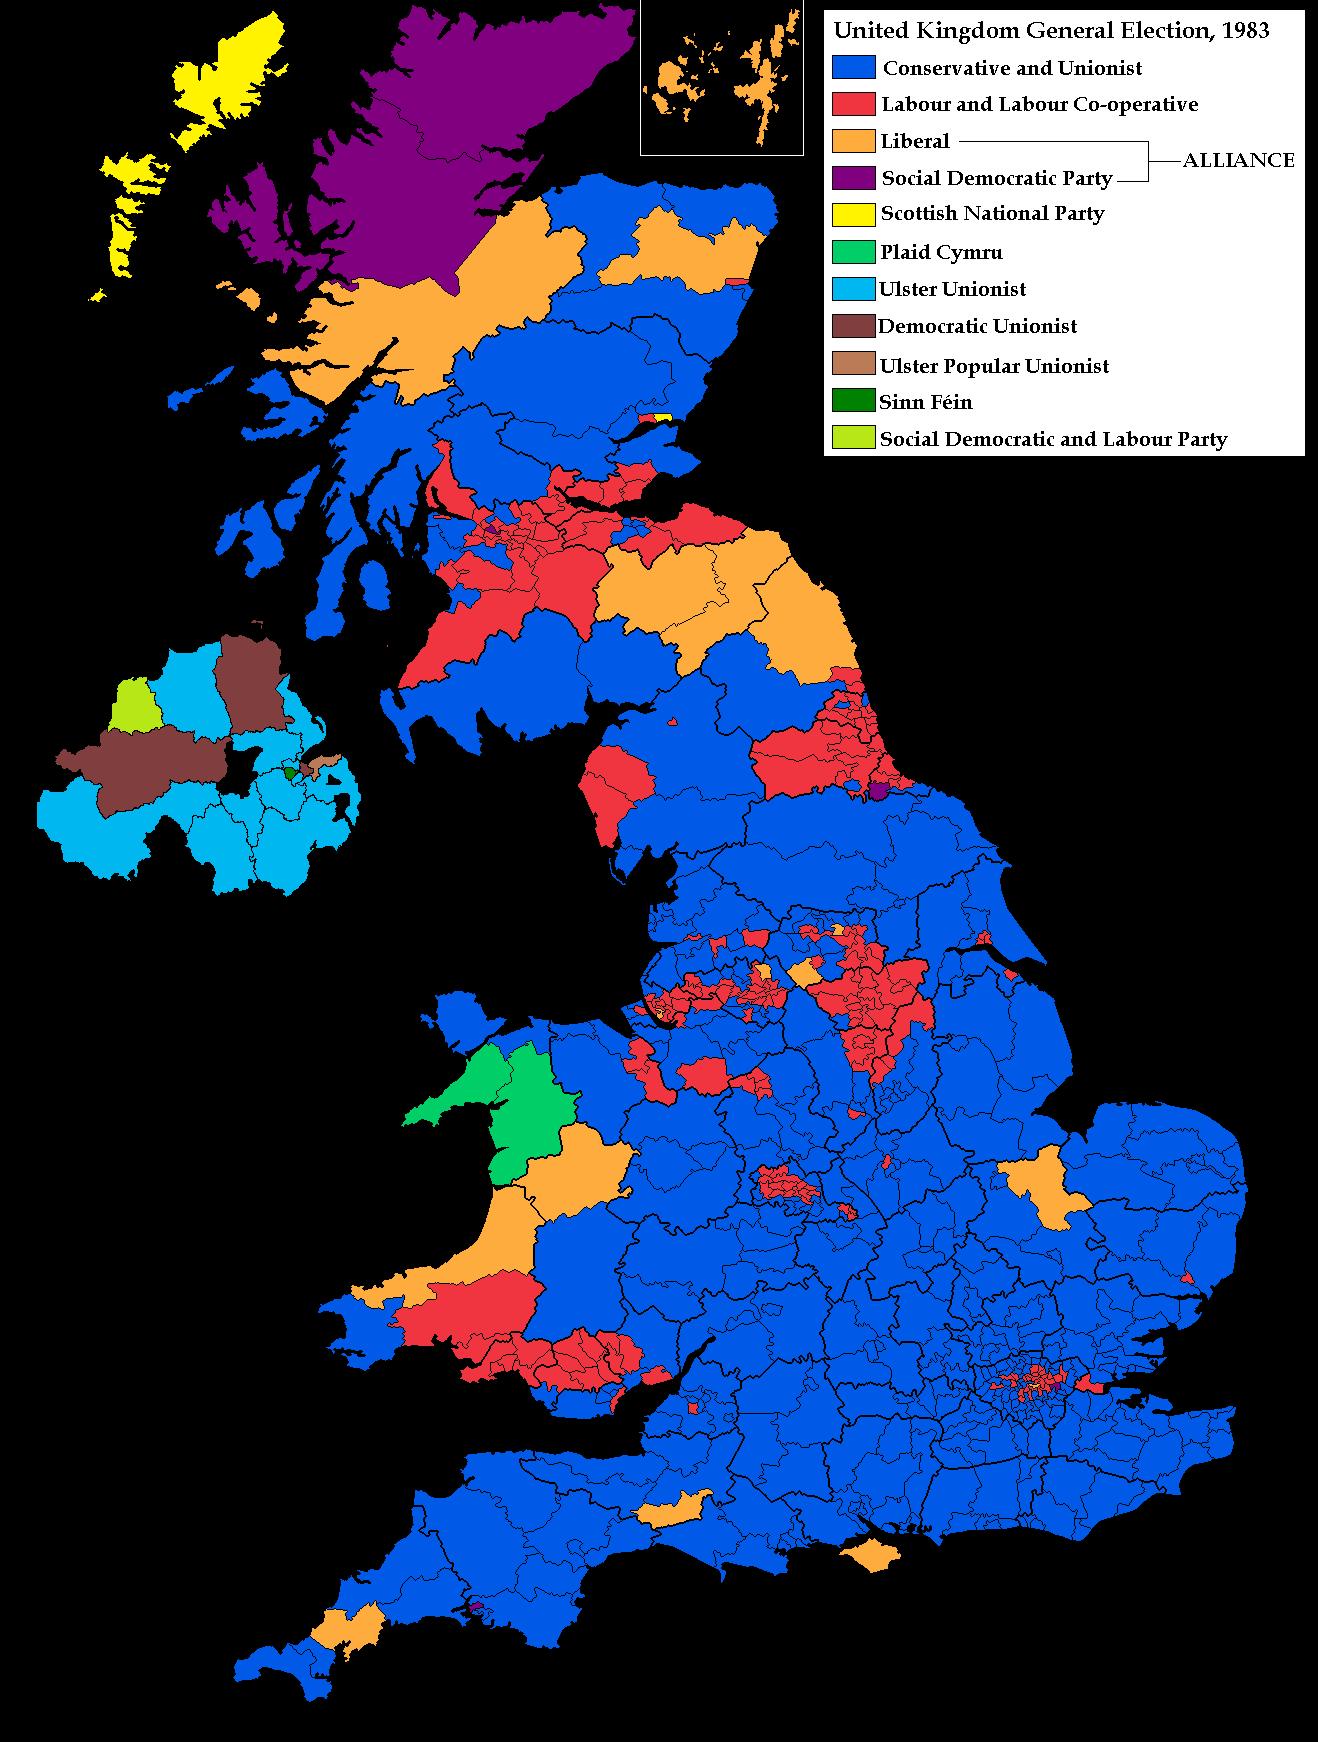 UK 1983.png